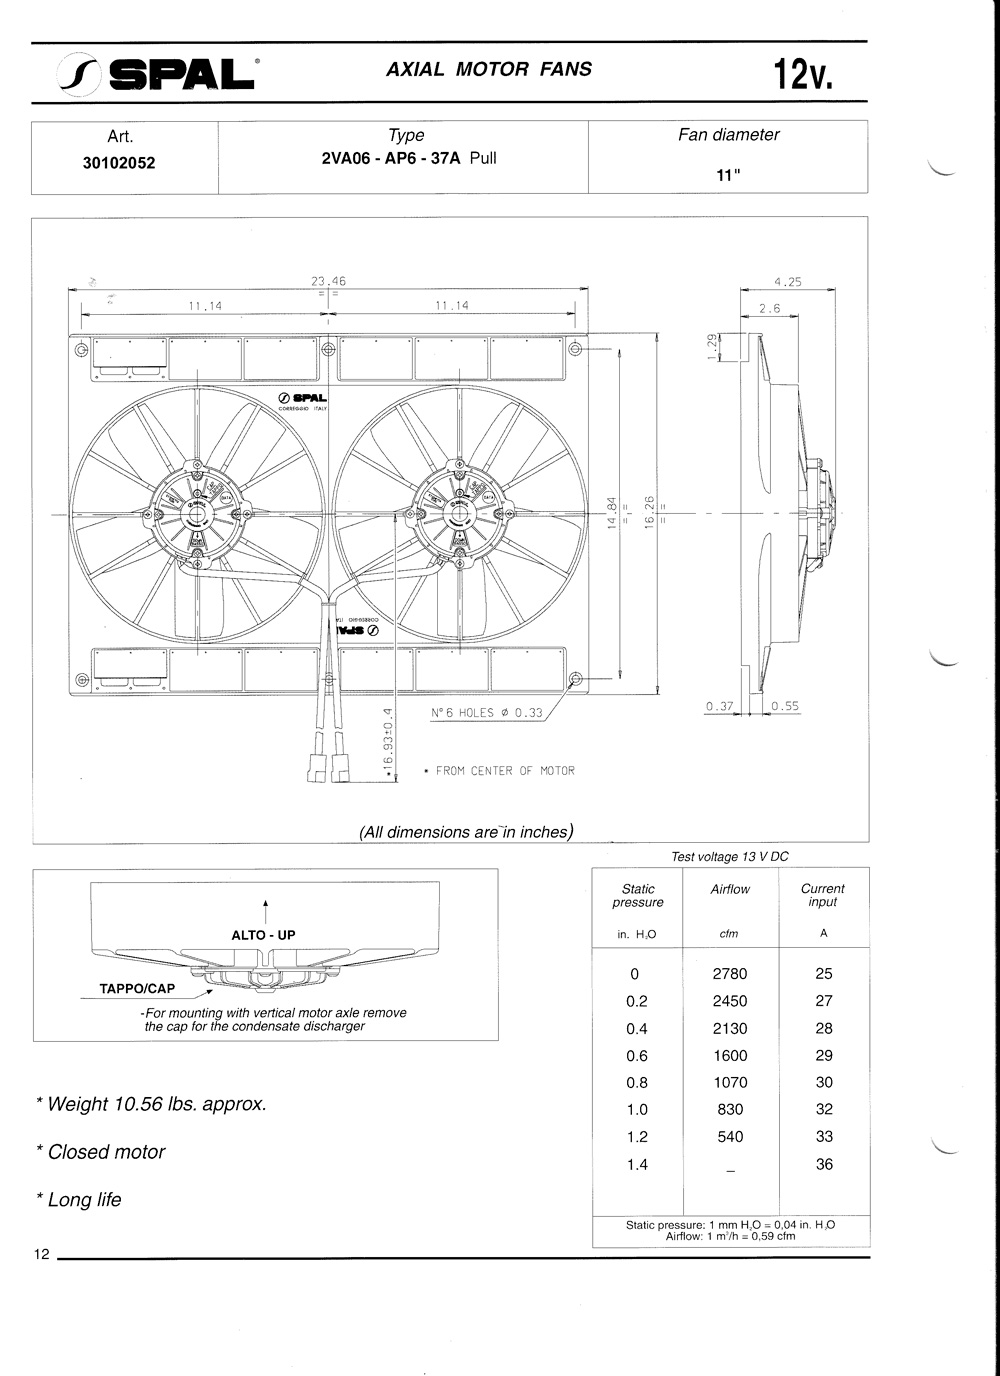 s10 v8 fan kit s10v8 parts Mongo's Garage S10 Frame Swap s10 v8 fan kit